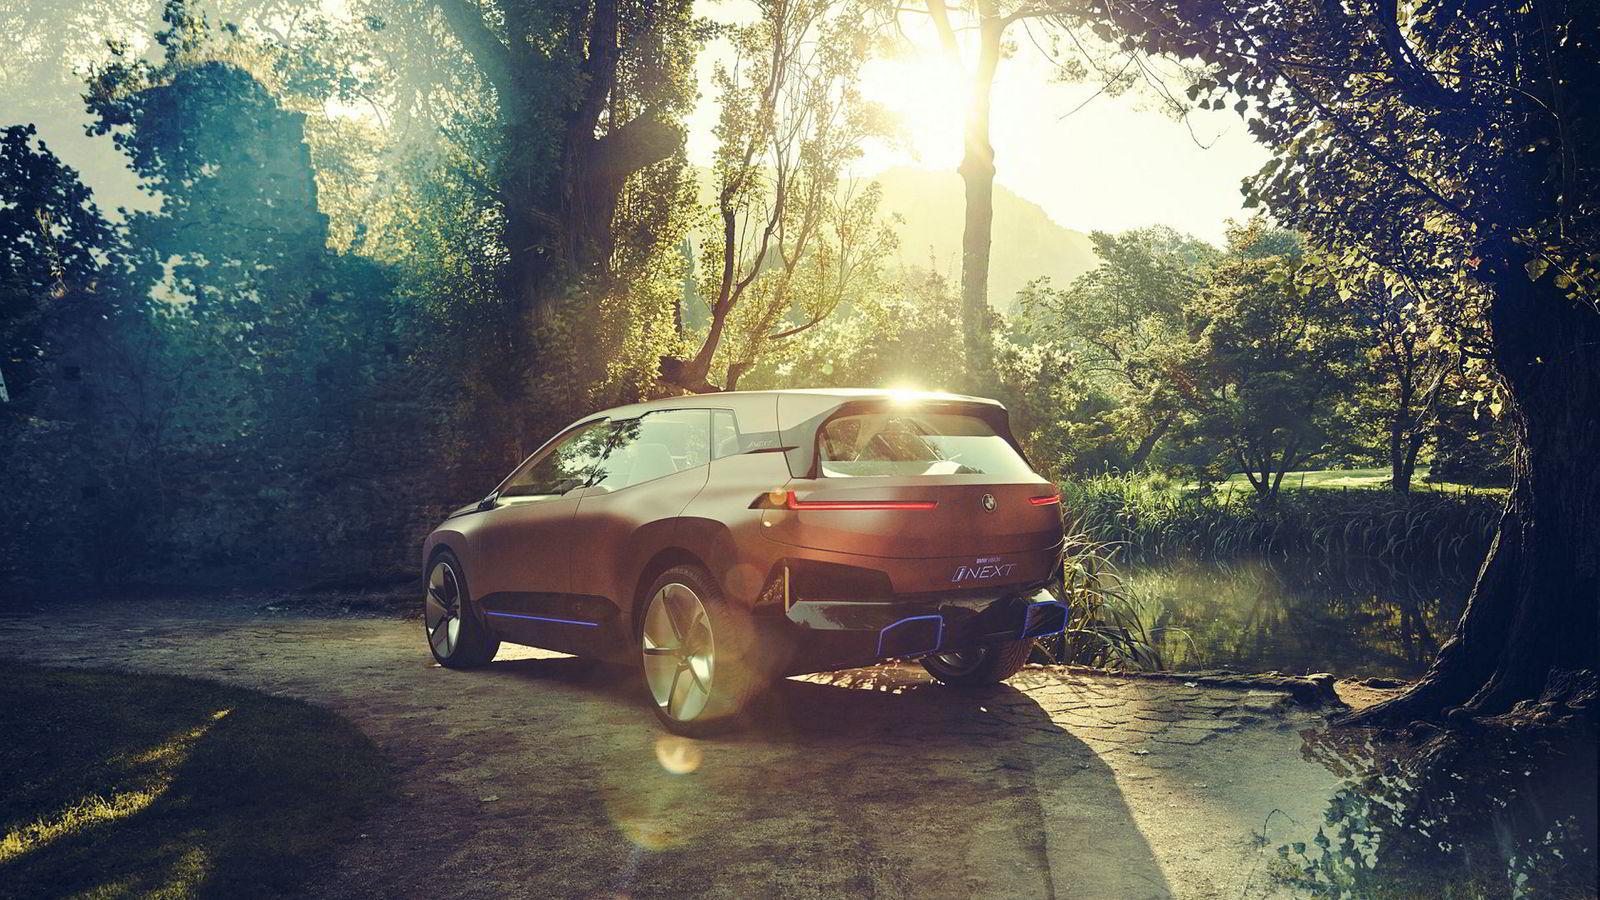 BMW Vision iNext viser hvordan BMW elbil som kommer i 2021 vil se ut.